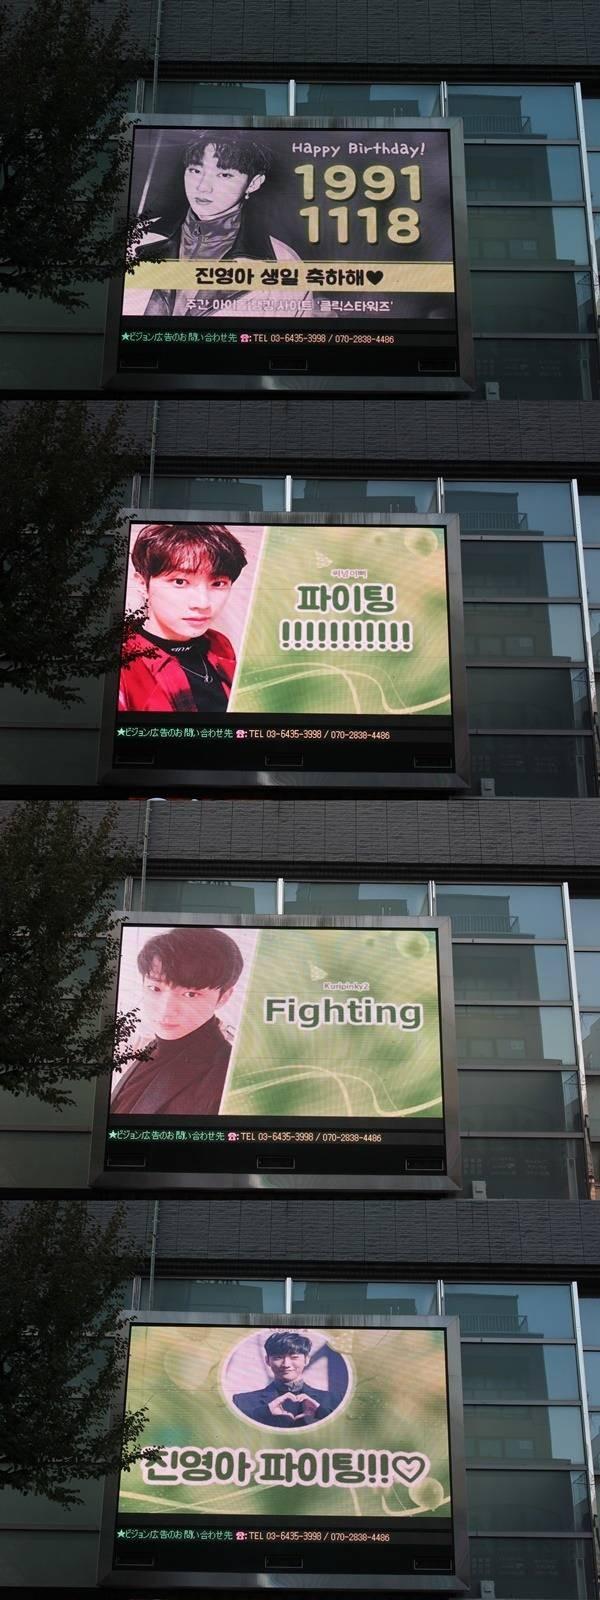 B1A4 진영, 日 물들인 생일 축하 전광판 '바나의 힘'